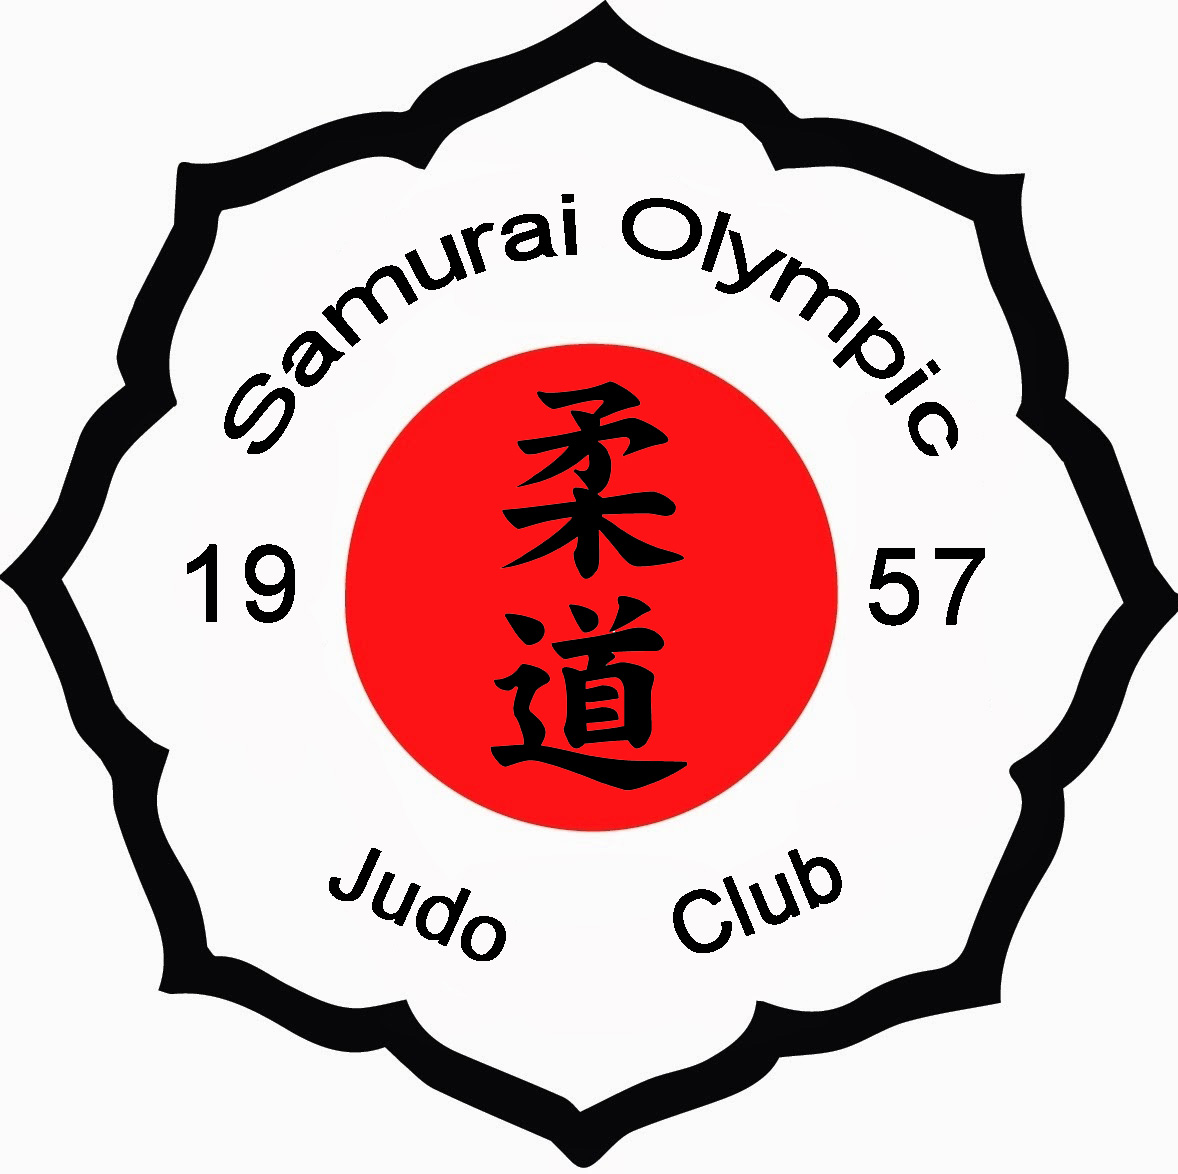 is judo safe for older adults